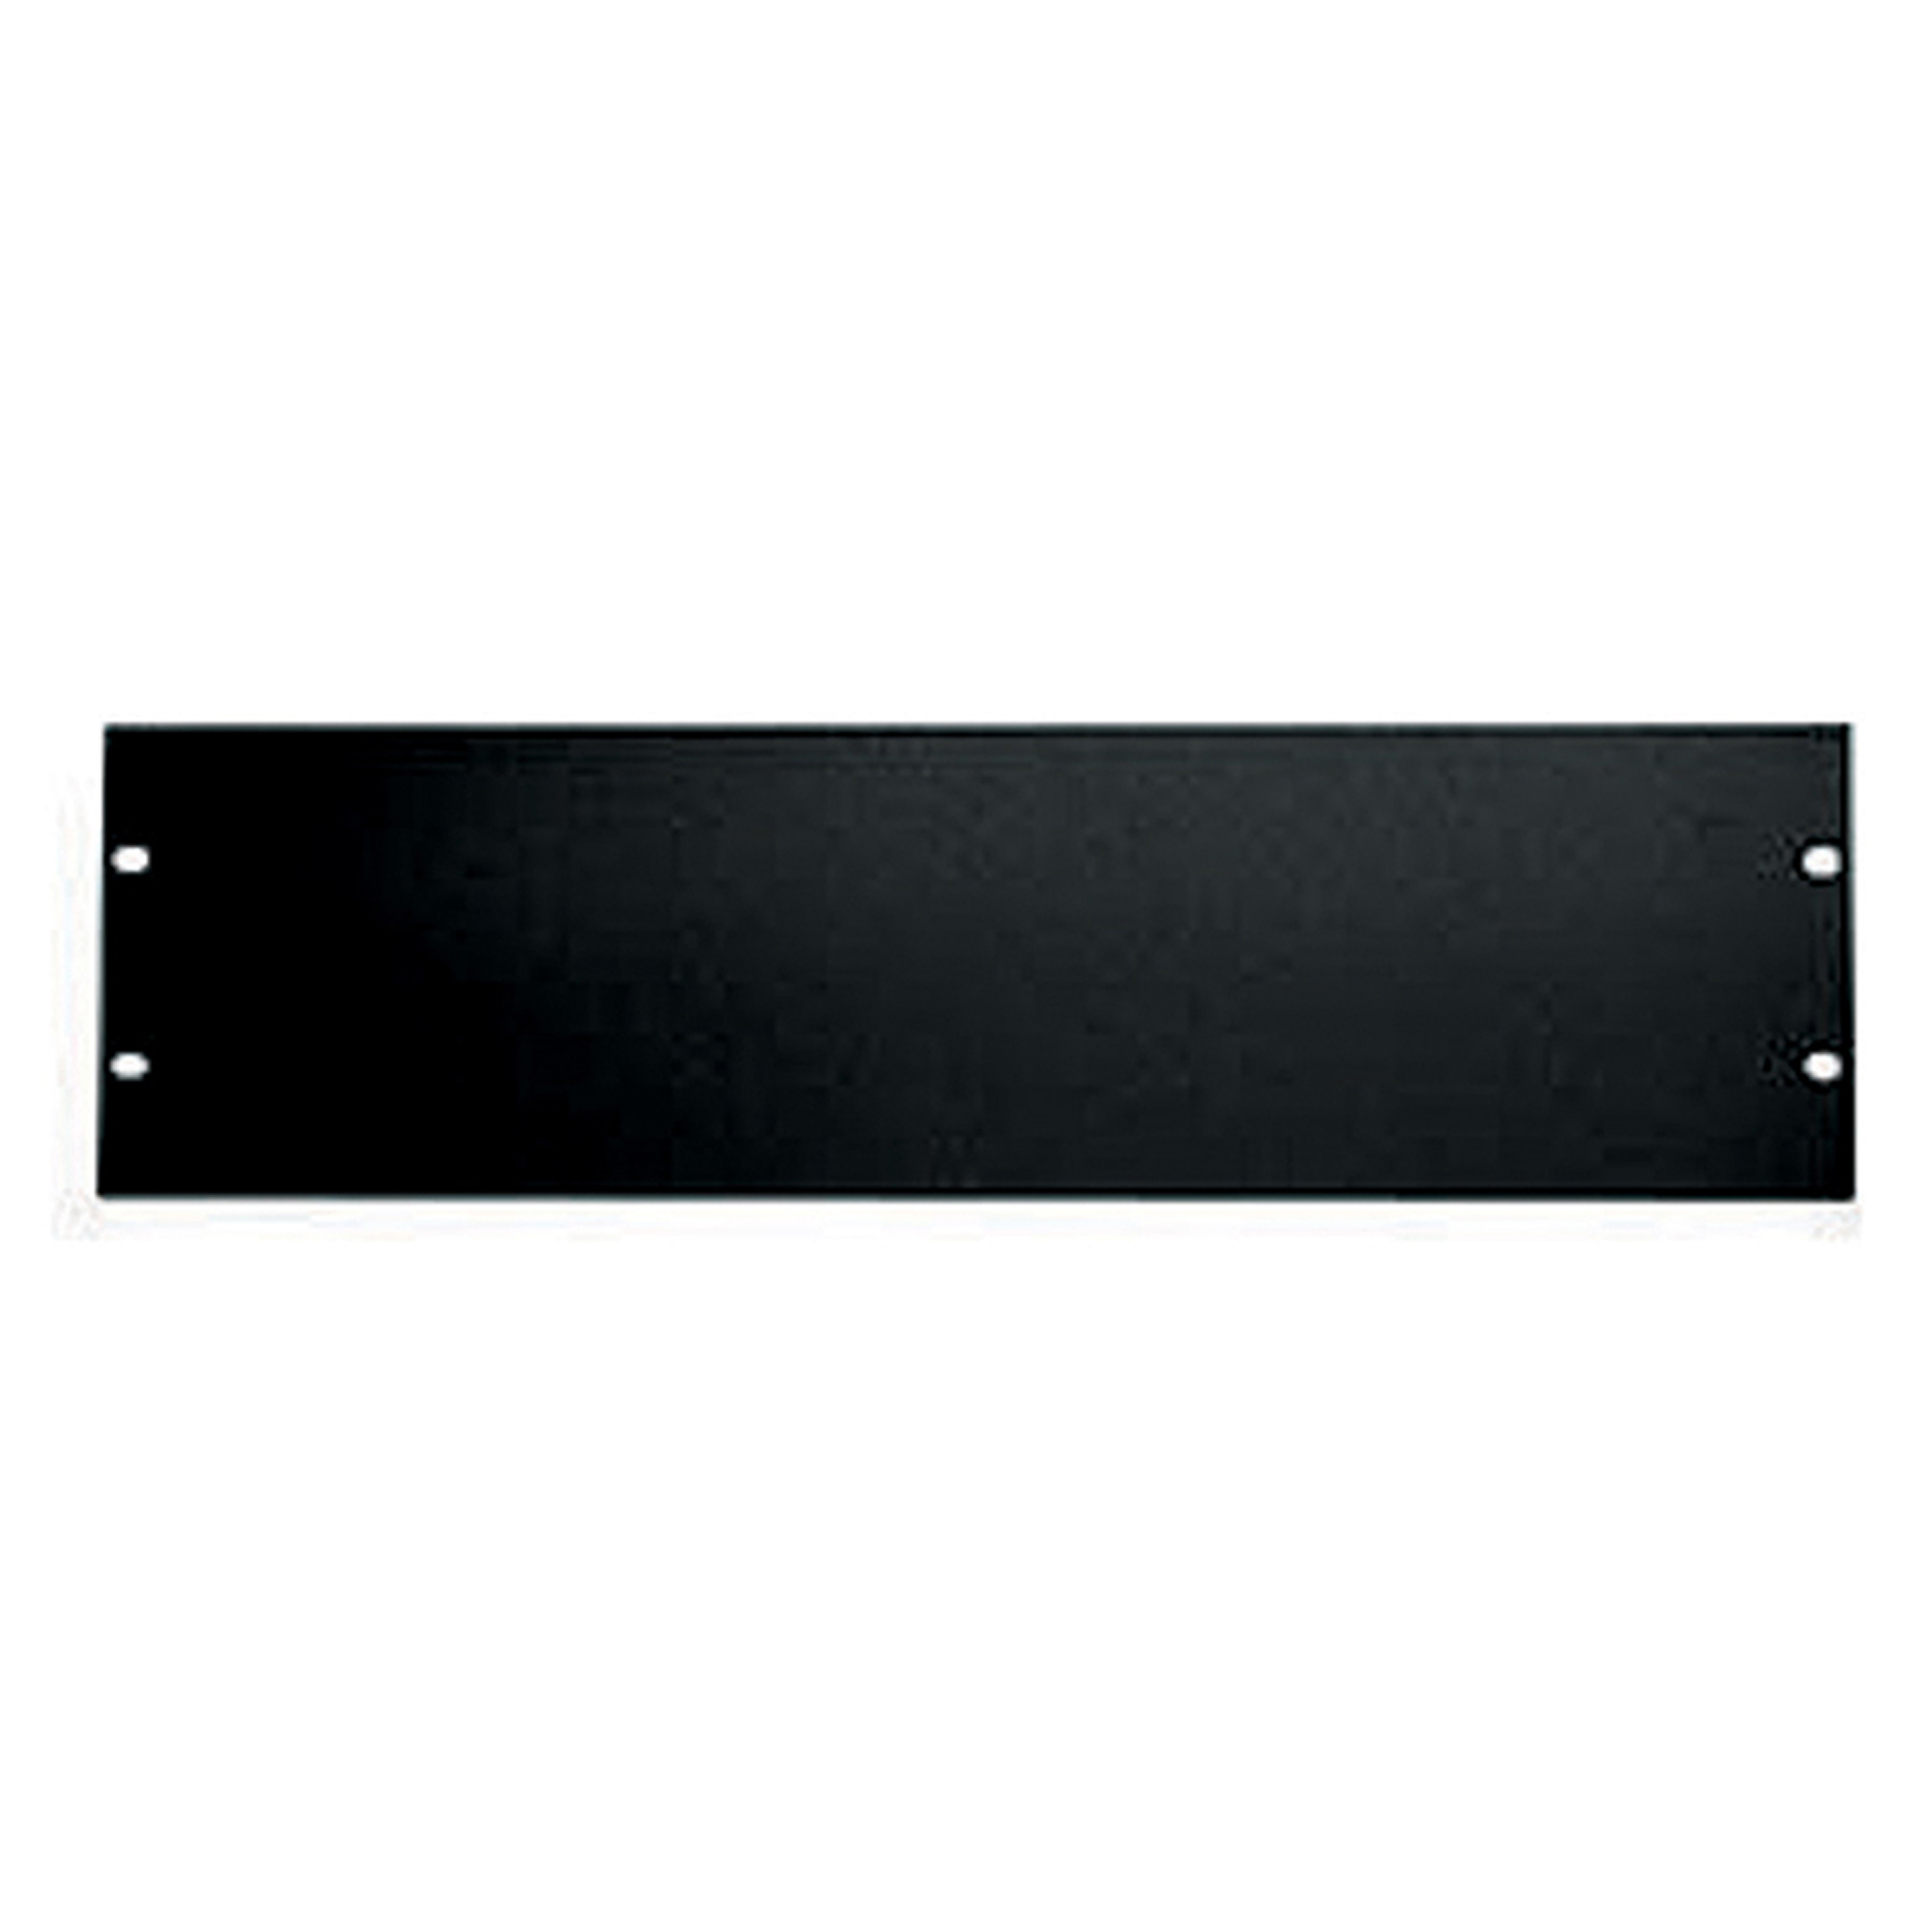 Soundlab L097FD Steel Rack Panel Rack Size 4U